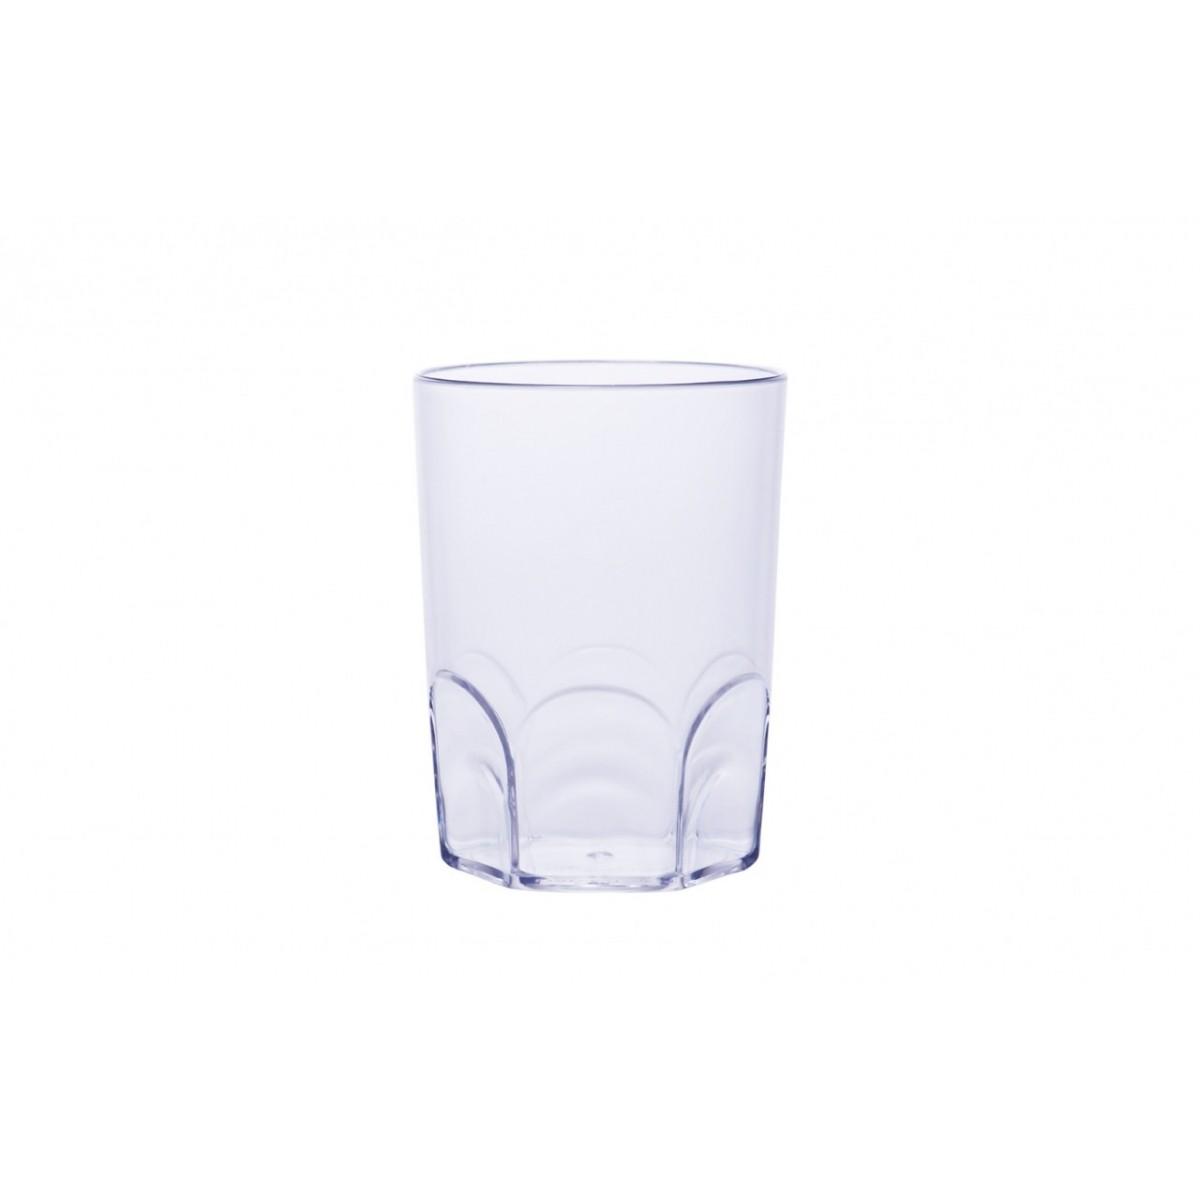 Copo Acrilico Whisky Cristal 190ml Bezavel